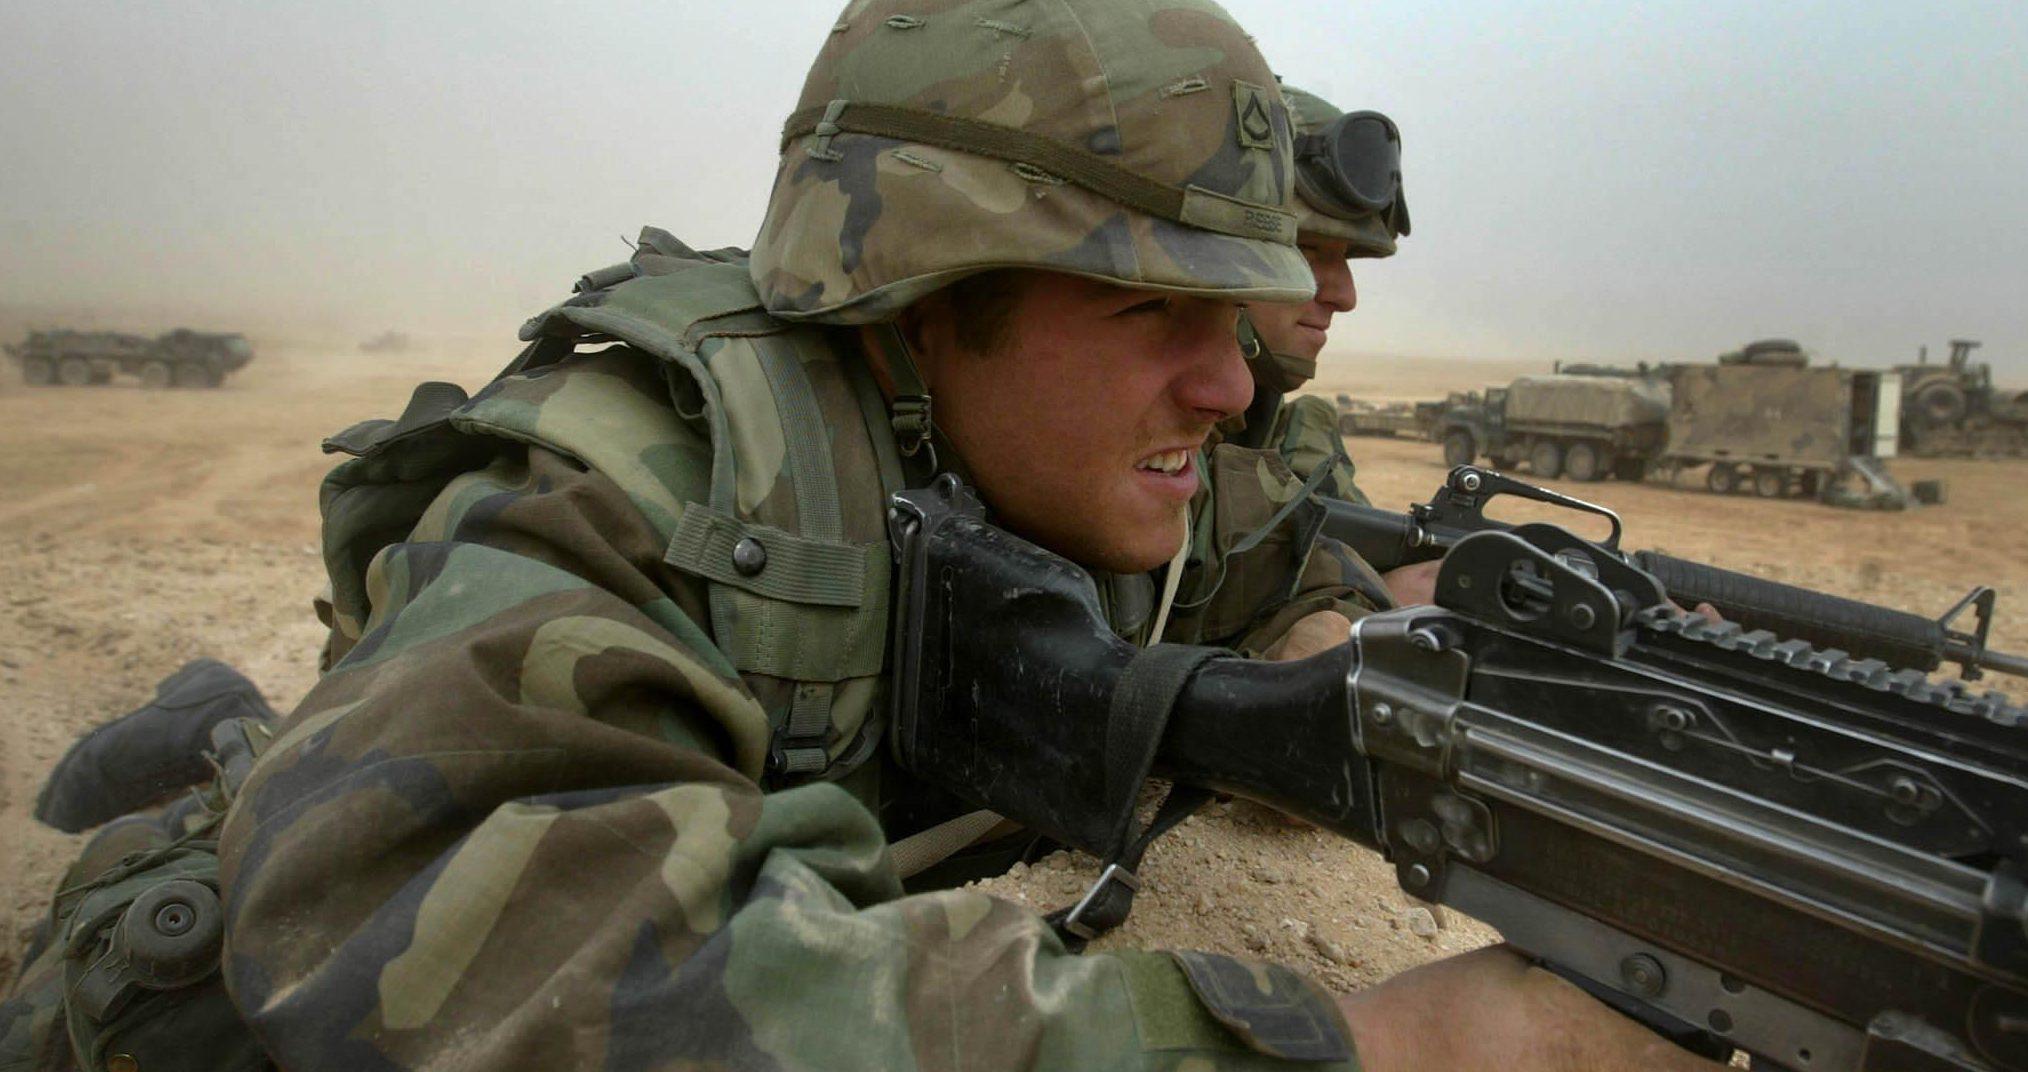 Iraq invasion 10 year anniversary - Photos - Iraq War 10